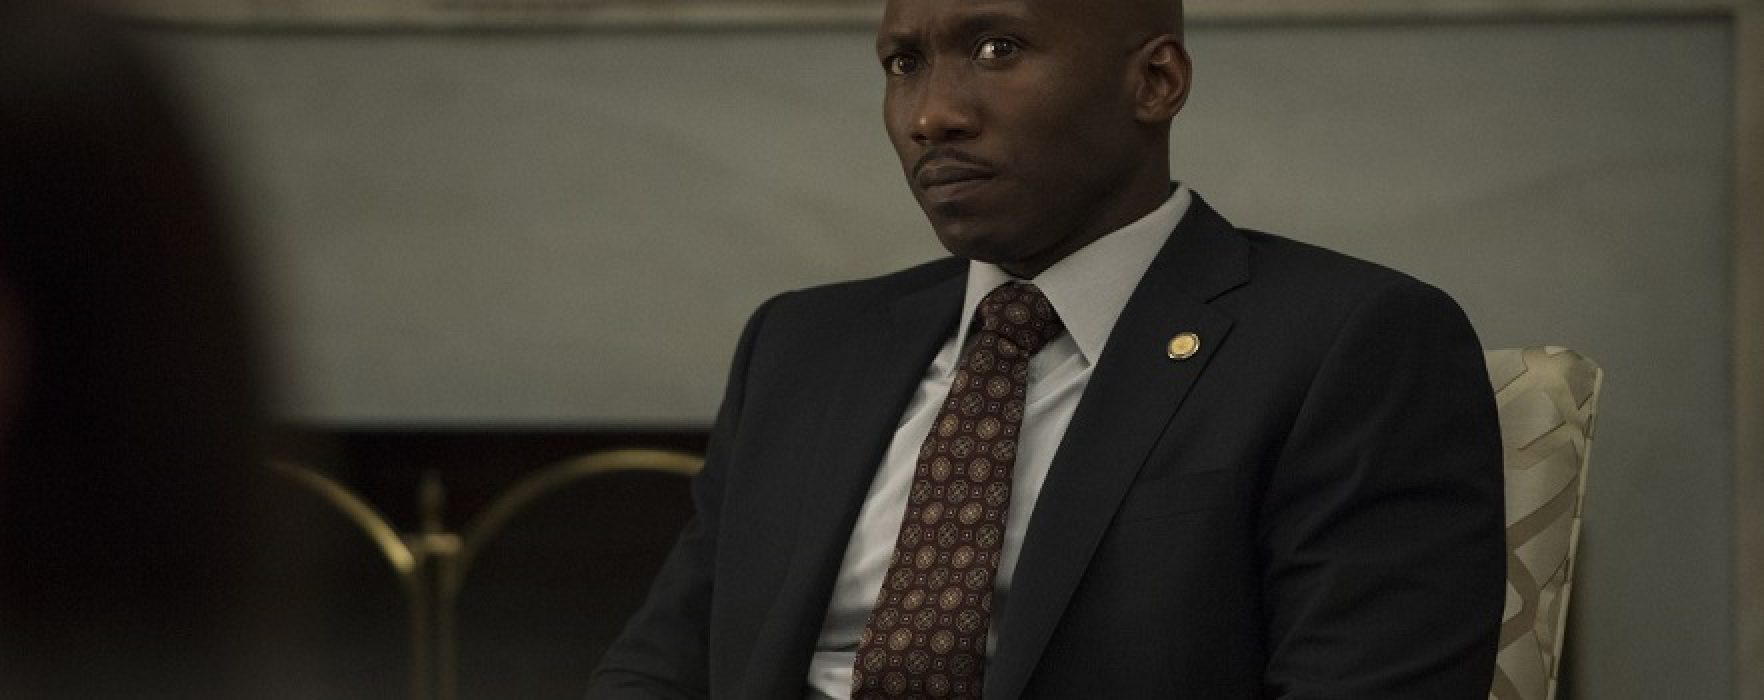 True Detective Season Three Will Star Mahershala Ali